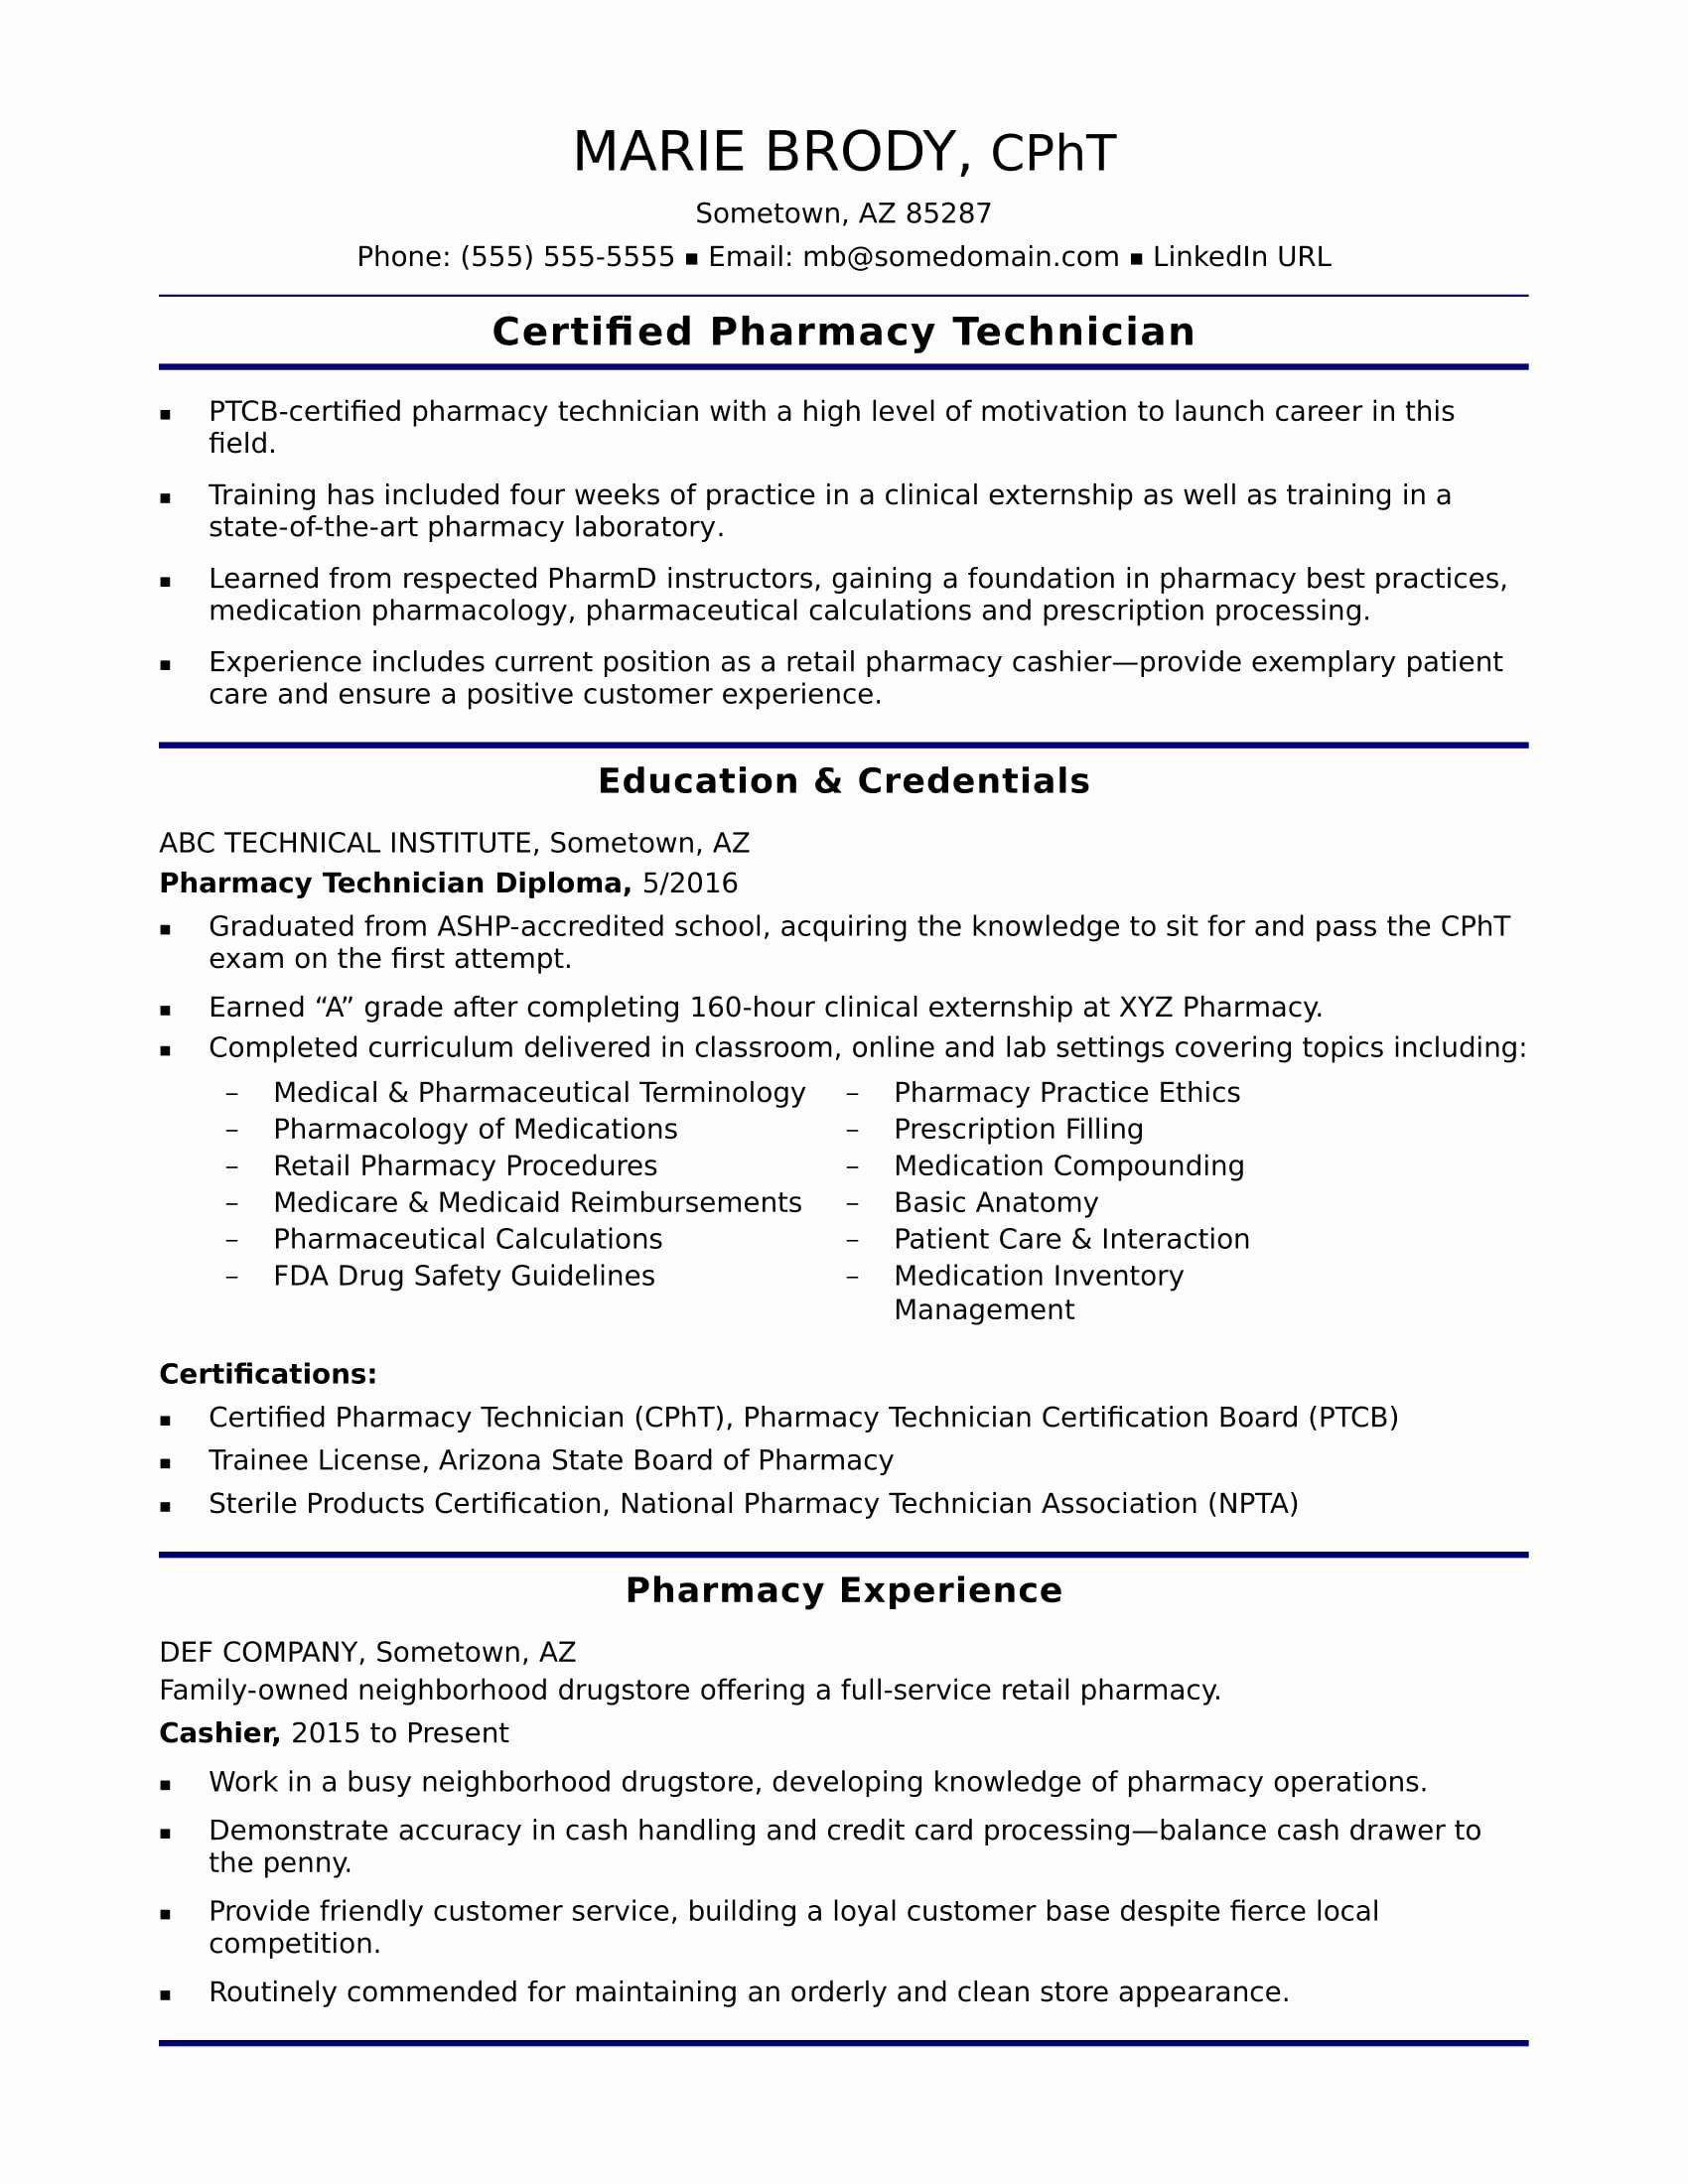 Pharmacy Tech Resume Samples Beautiful Entry Level Pharmacy Technician Resume Sample